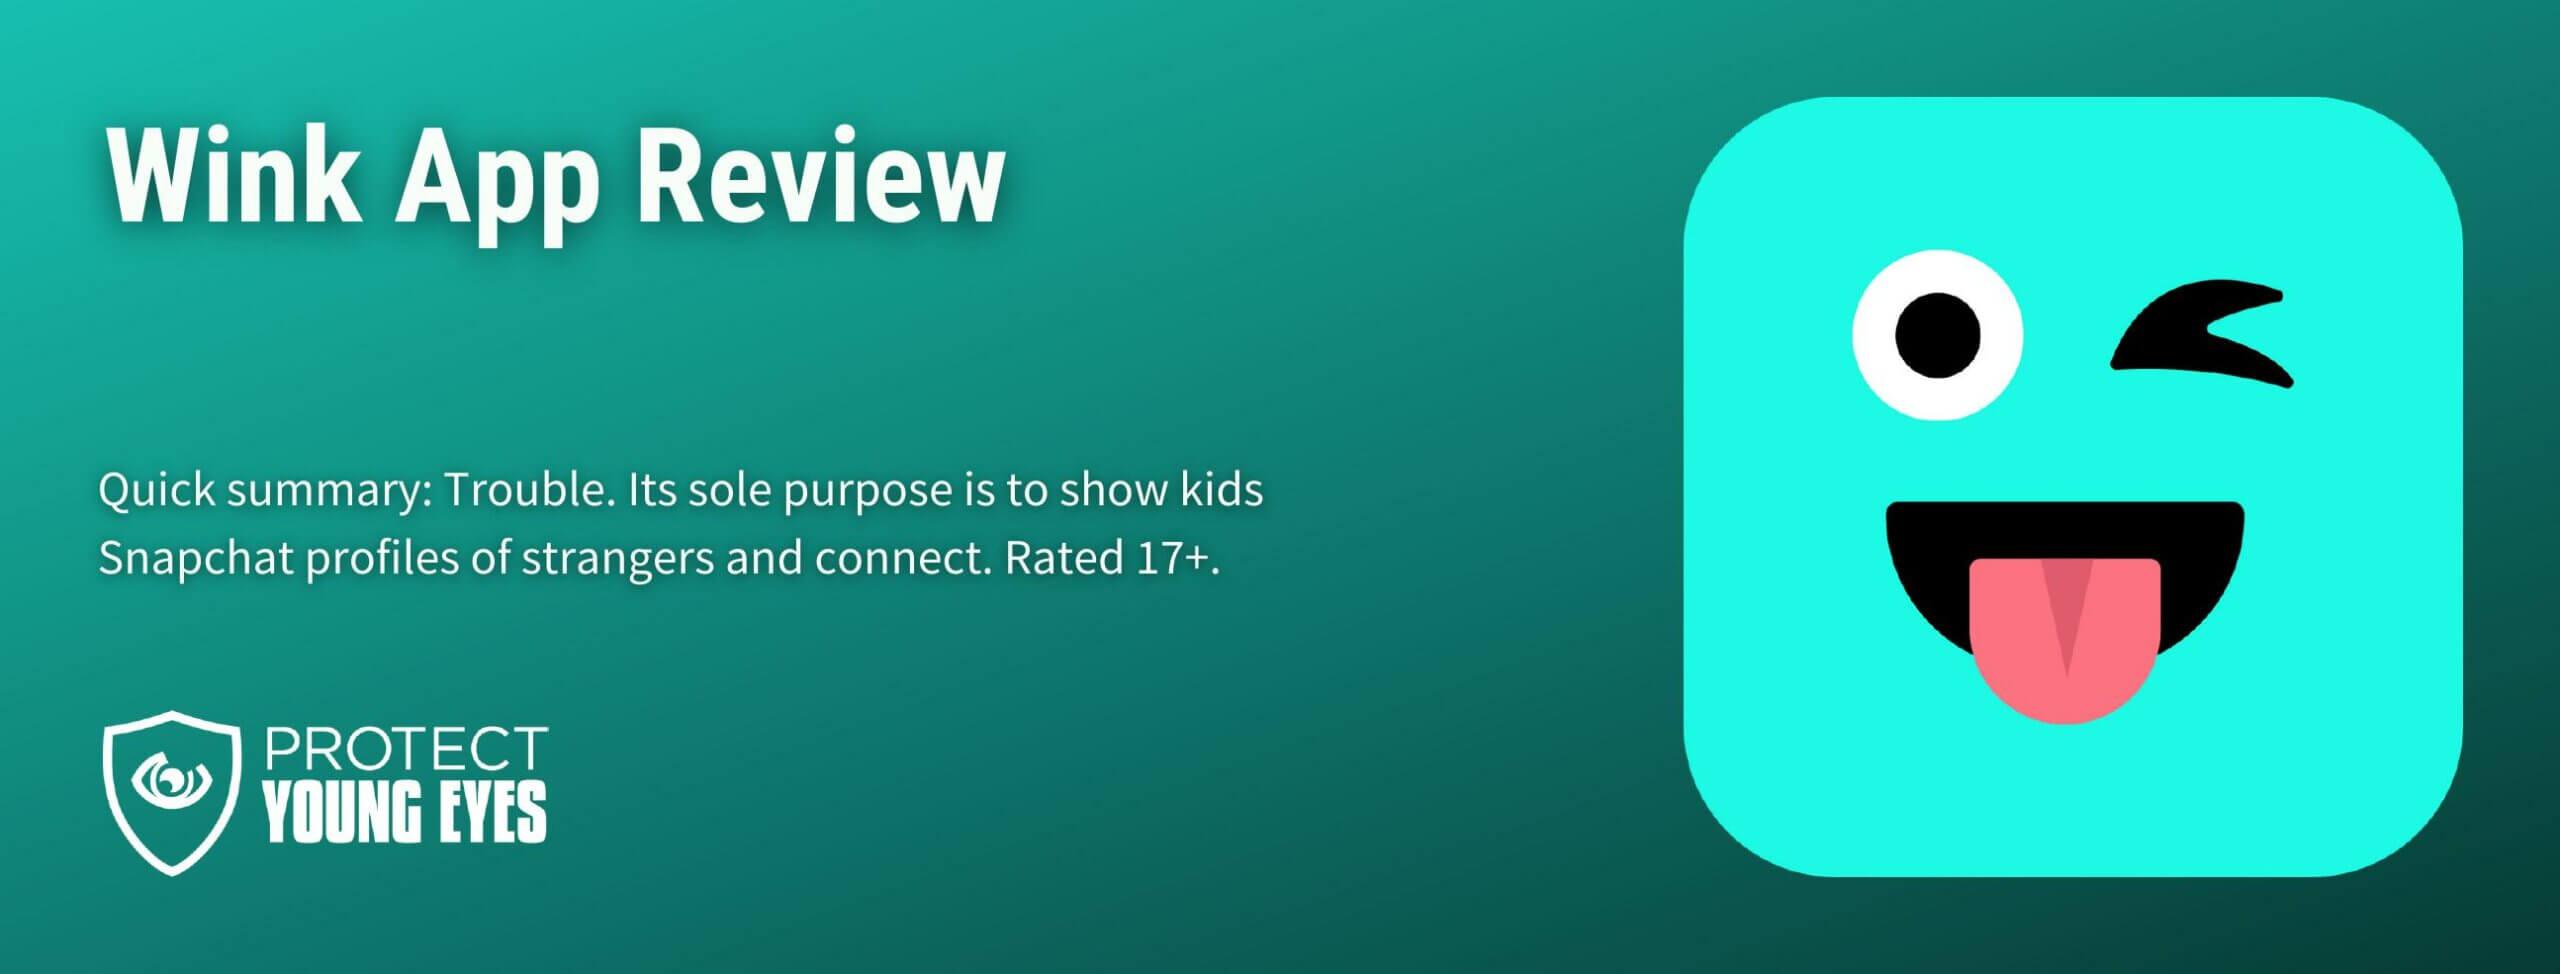 Wink App Review